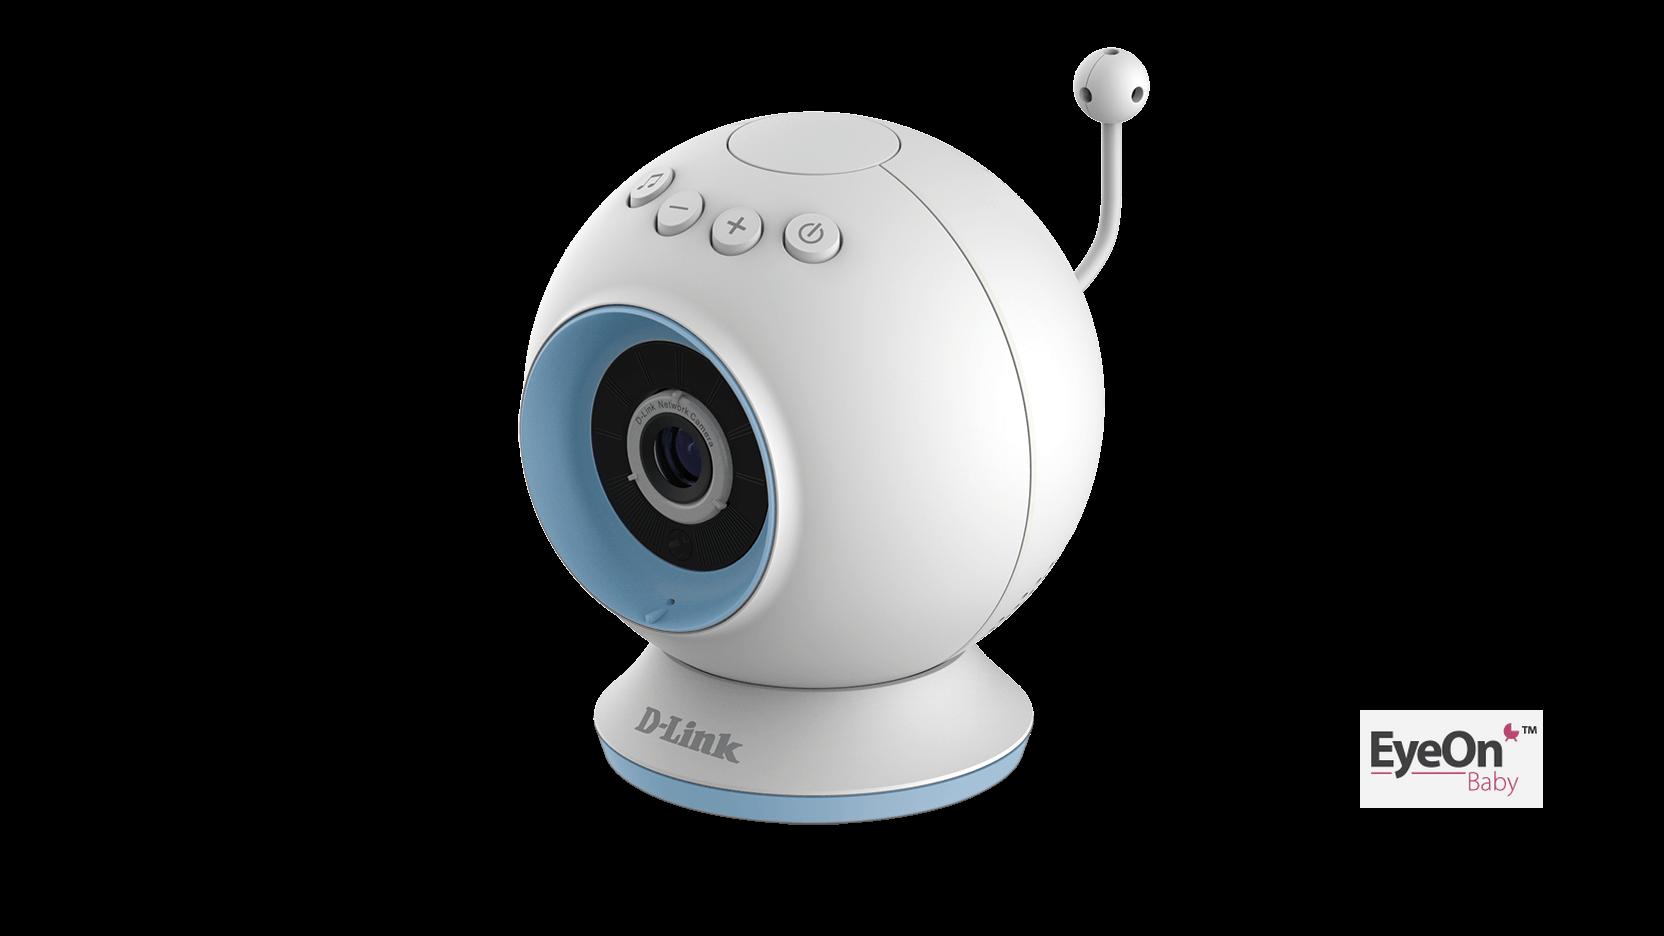 D-Link DCS-825L EyeOn Baby Camera Windows Vista 32-BIT